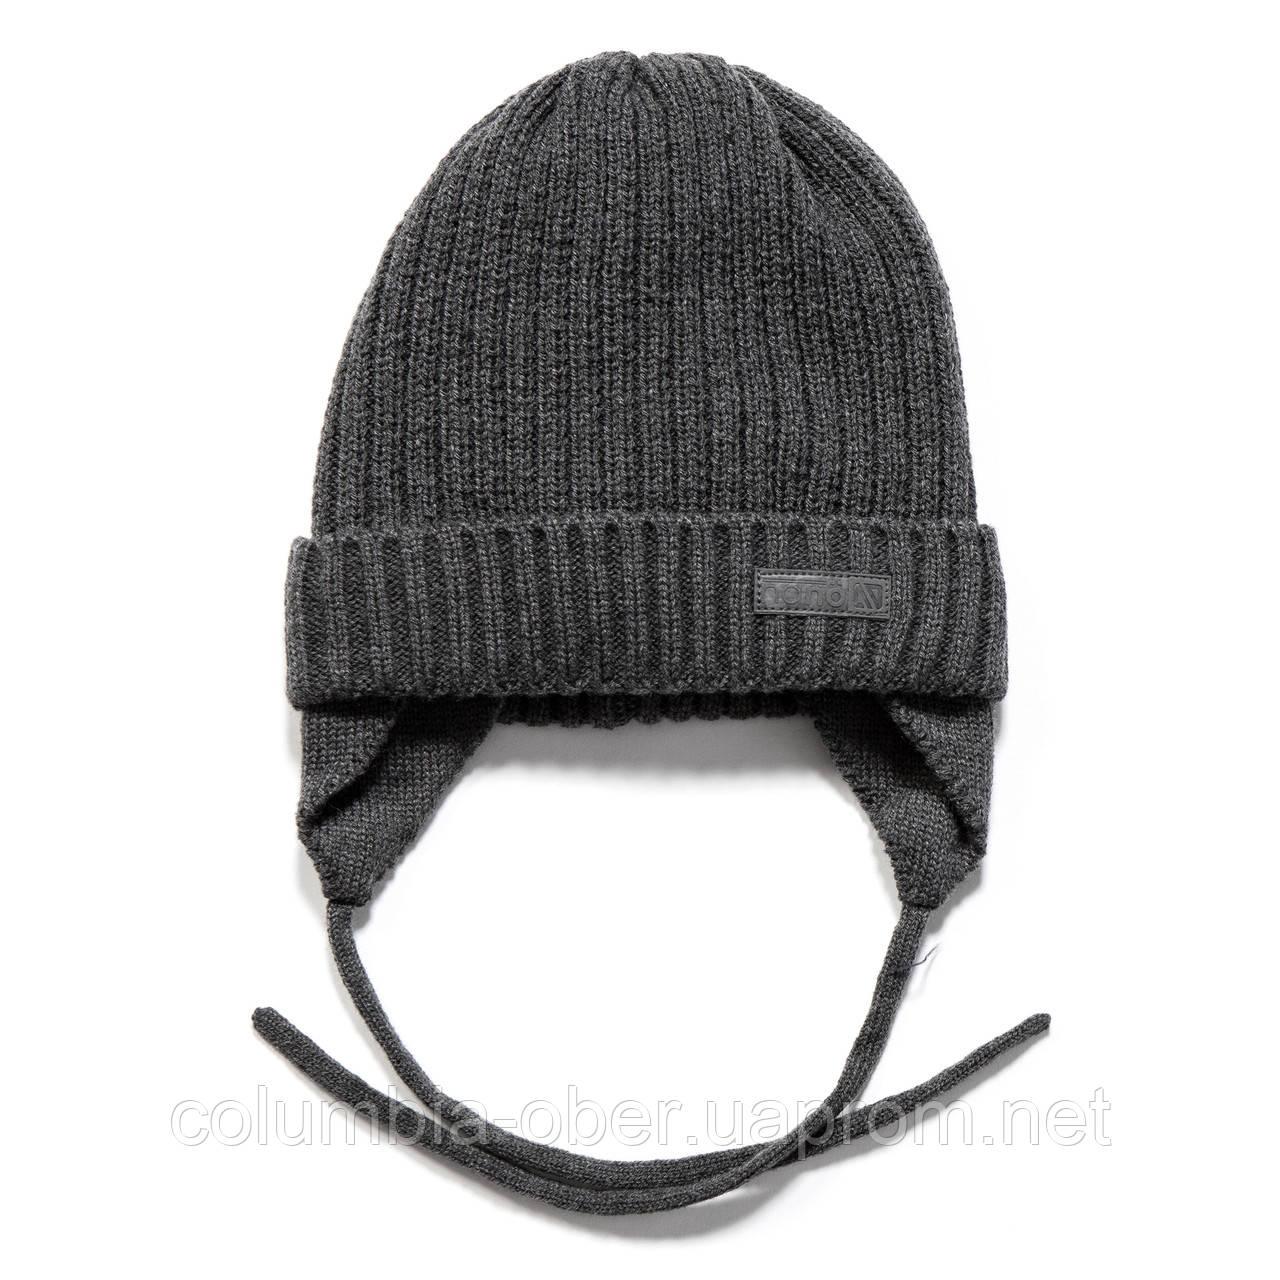 Зимняя шапка для мальчика Nano F17 TU 259Greyness Mix. Размеры 2/3х -  7/12.